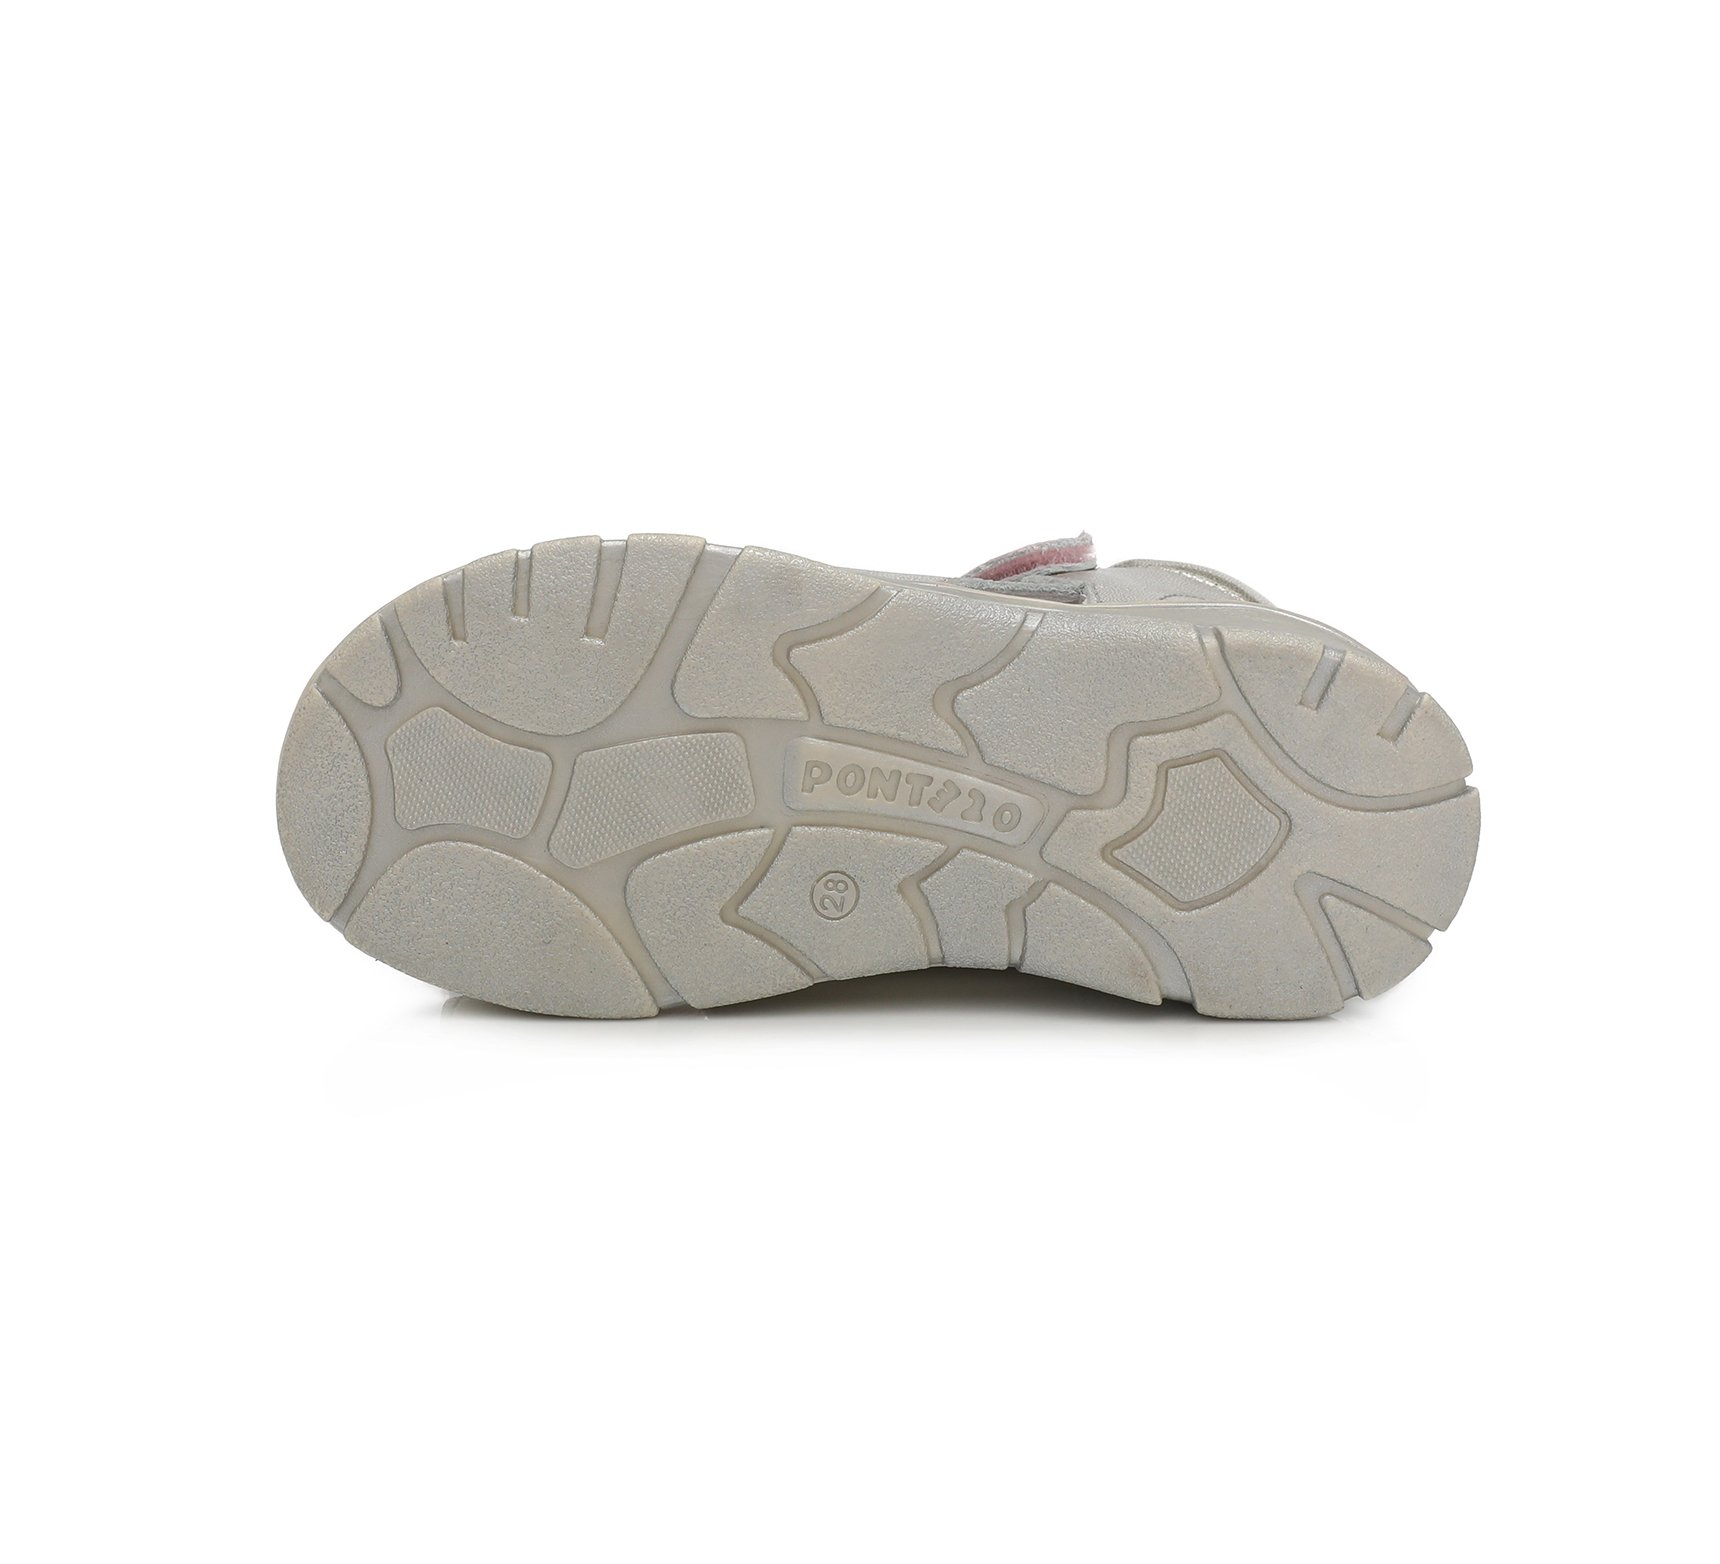 Sandals DA05-1-673 Ponte20